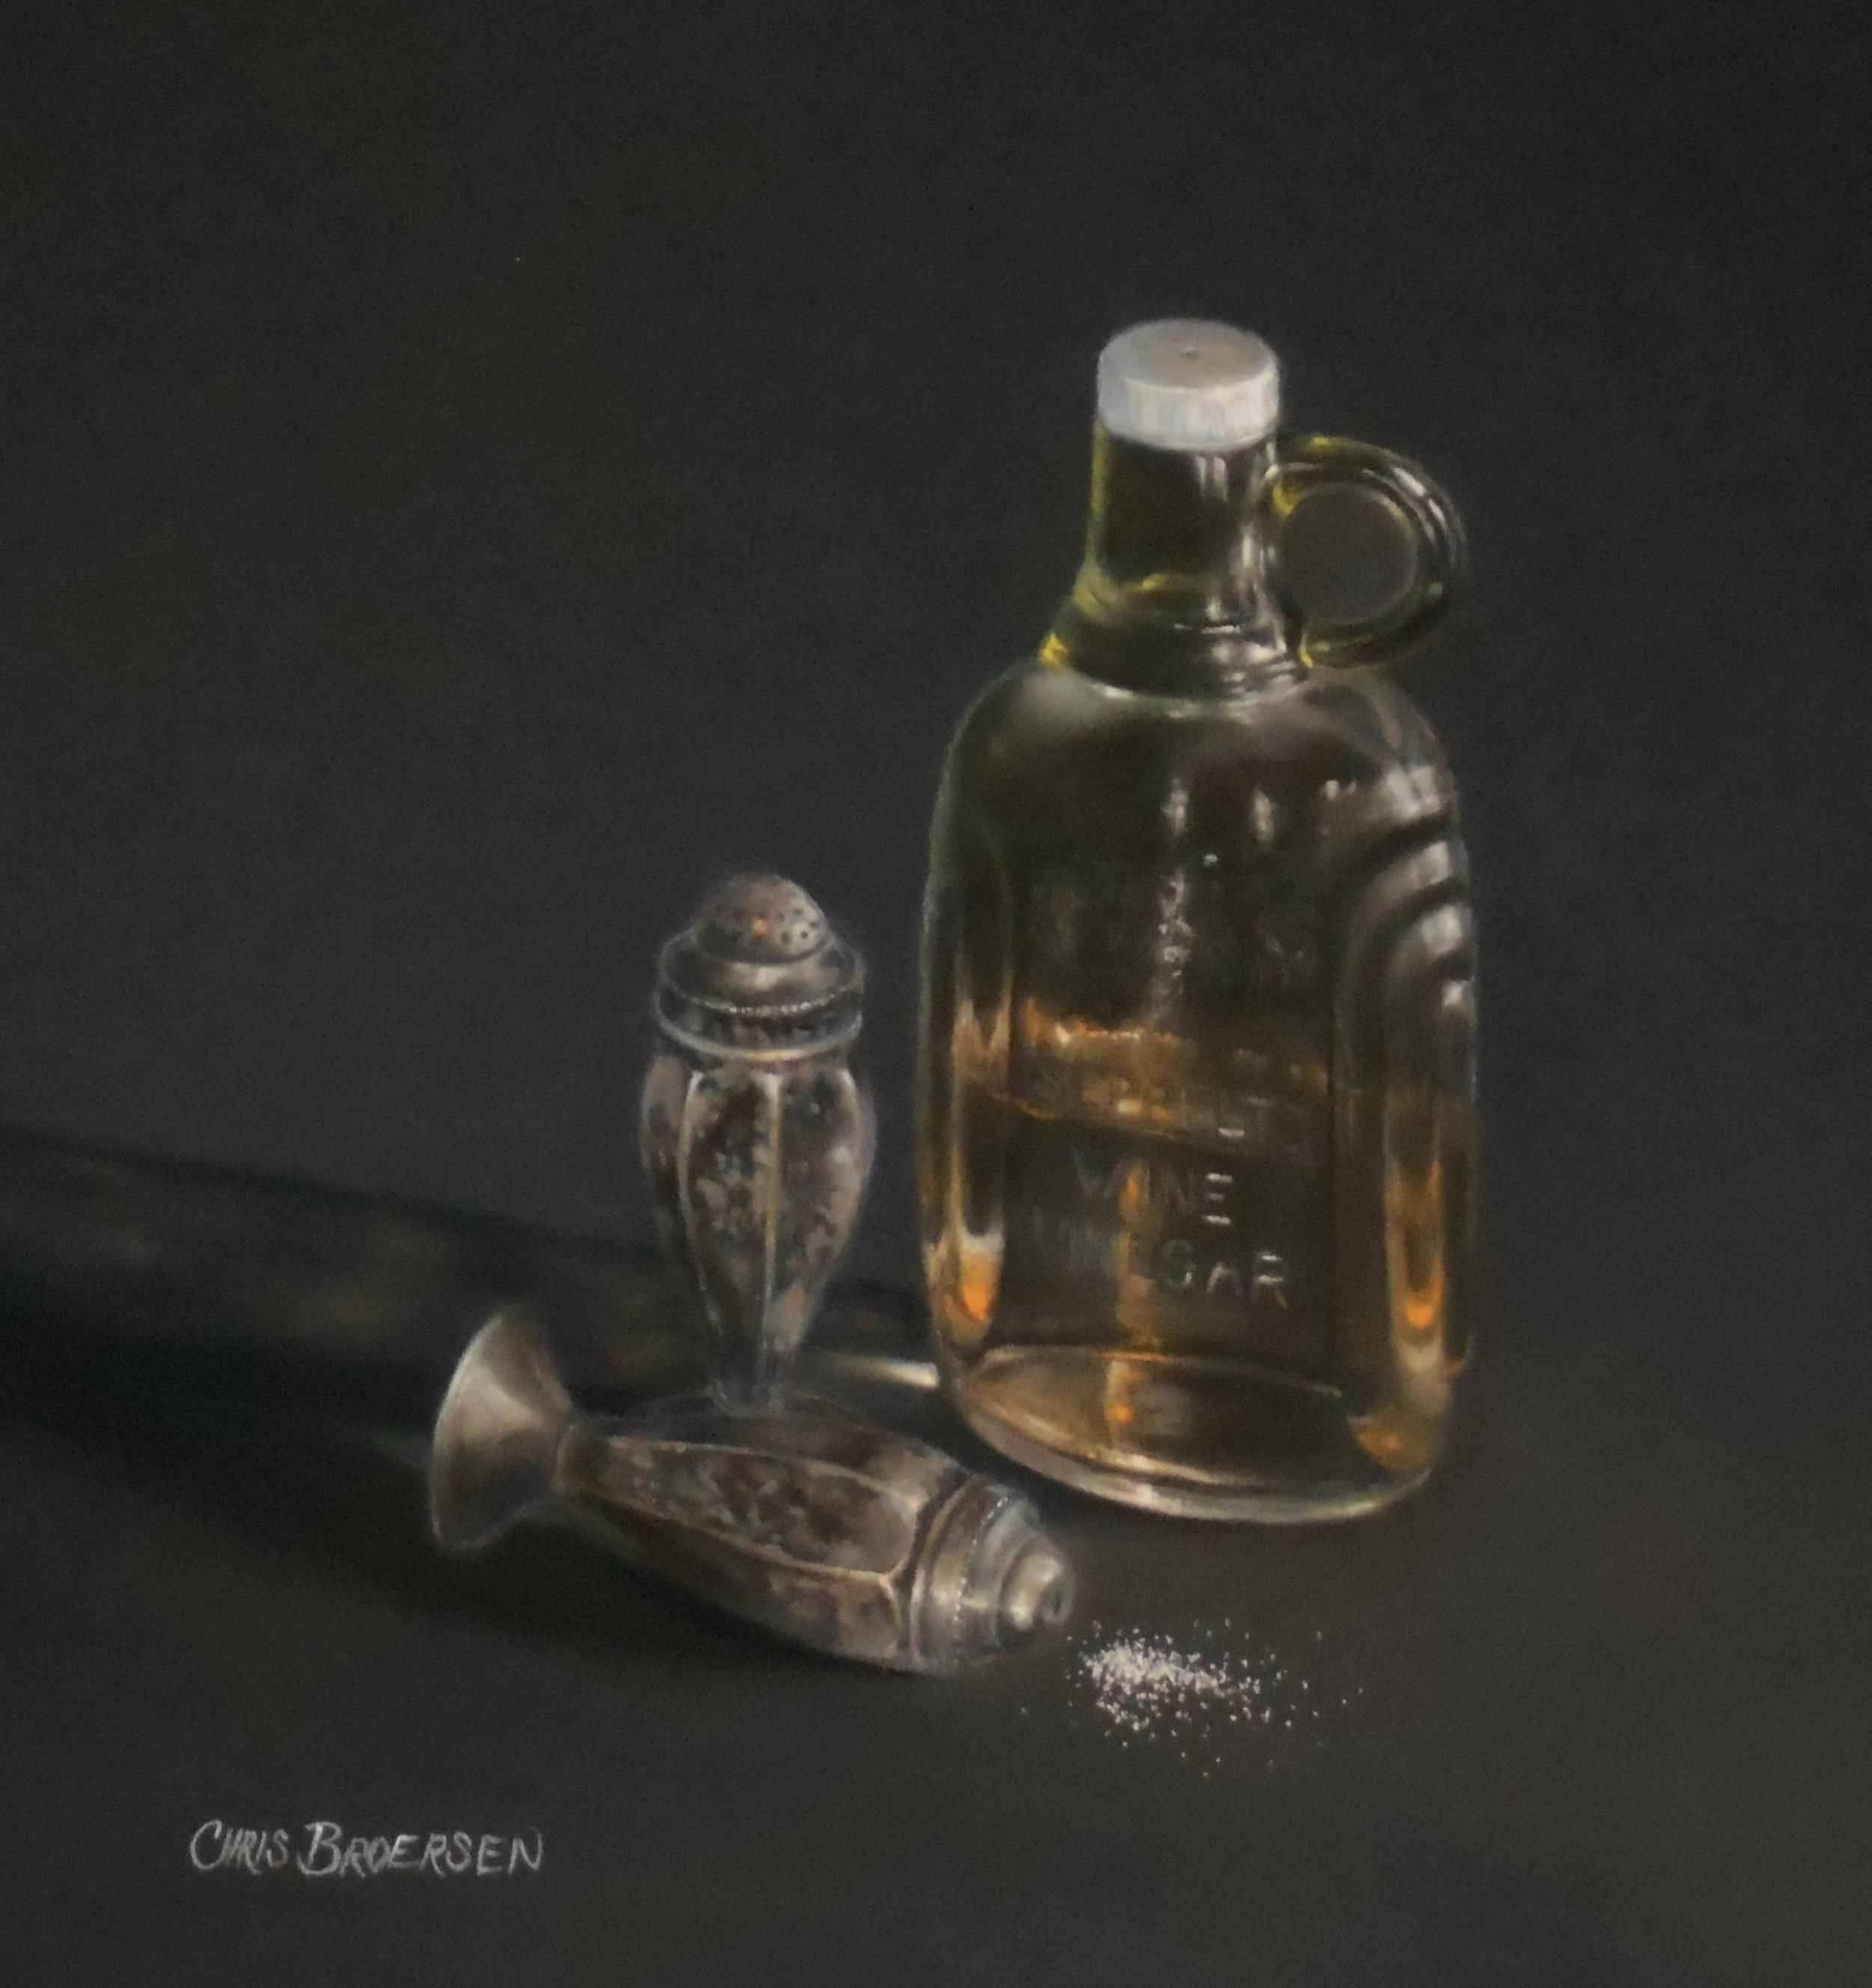 Salt and Vinegar